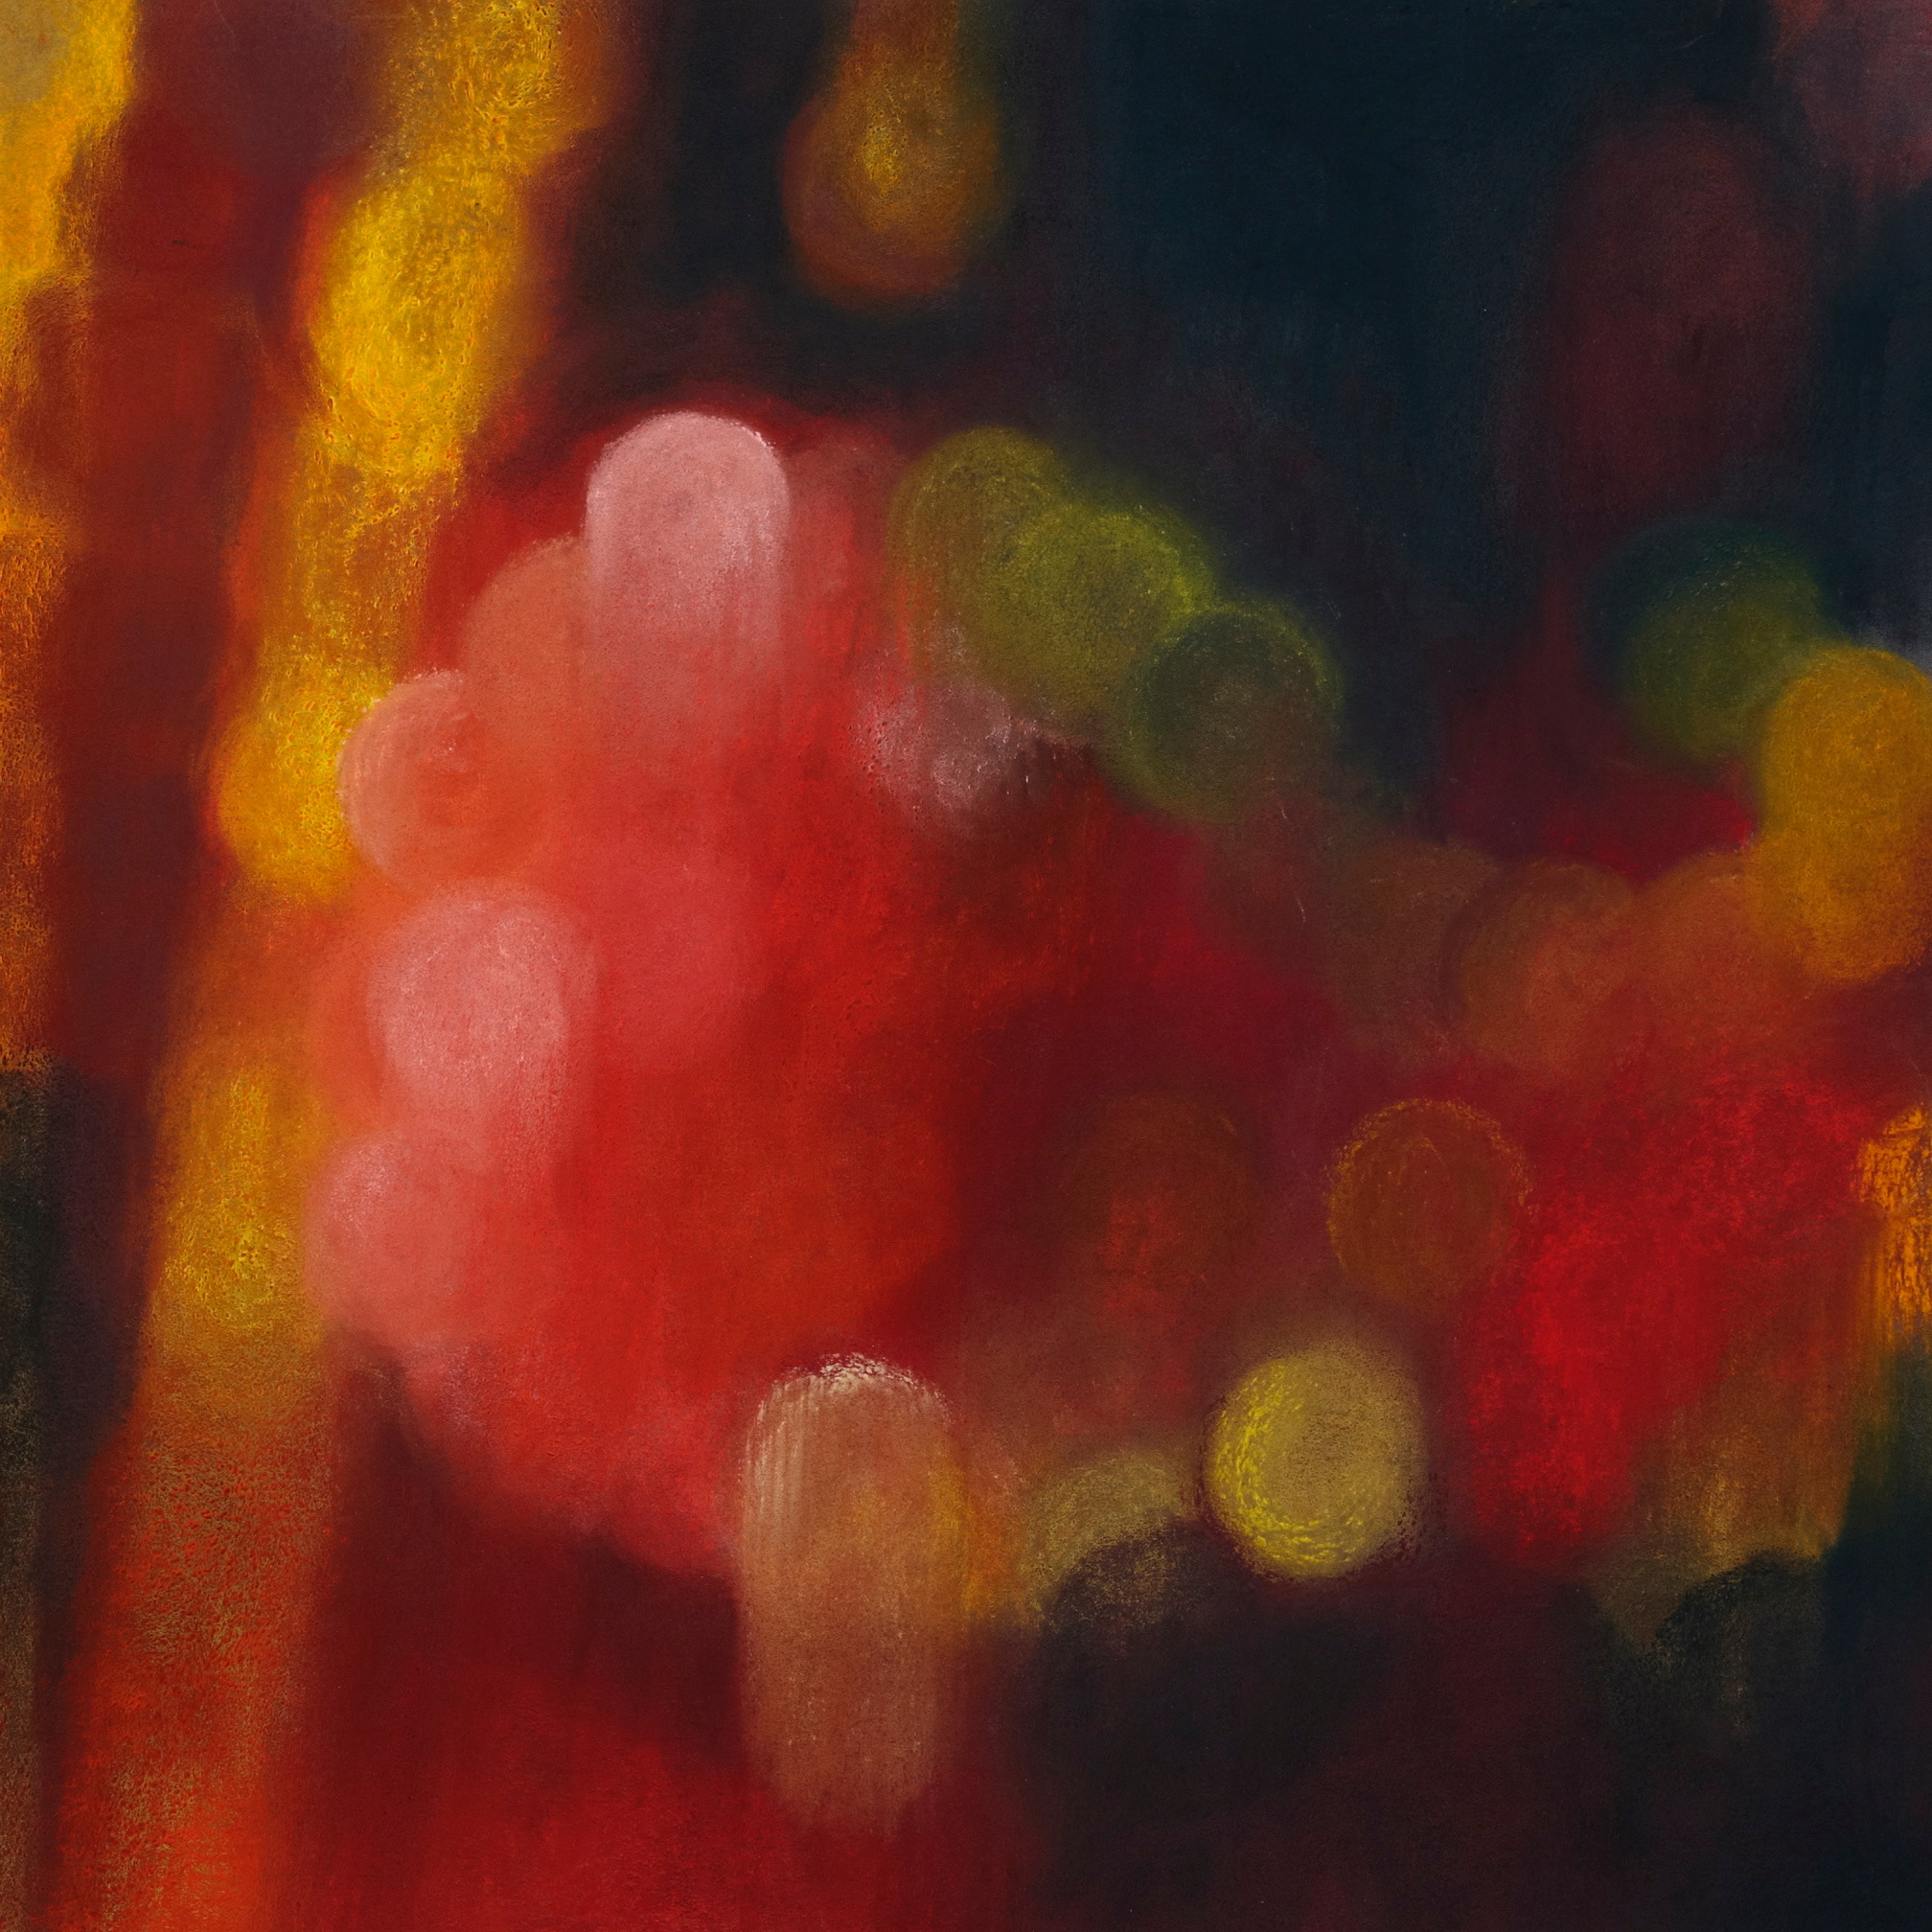 Shanghai glow, 2009, pastel on paper, 40.5x 40.5cm